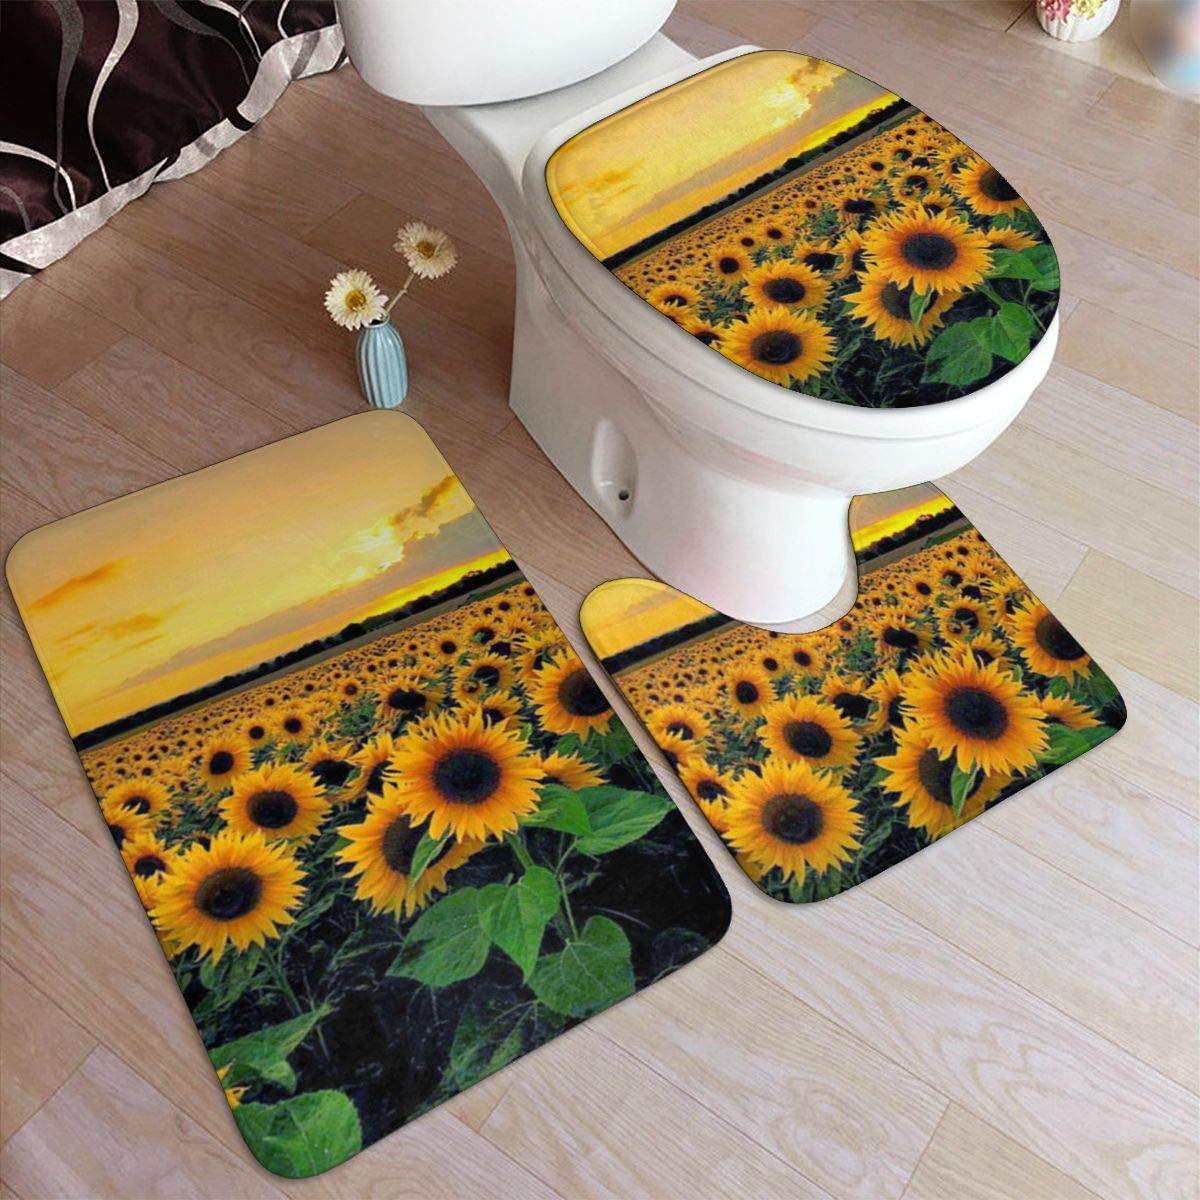 Bath Rugs Toilet Three-Piece Floor mat, Sunflowers Flannel Embossing Bath Rugs 50x80cm